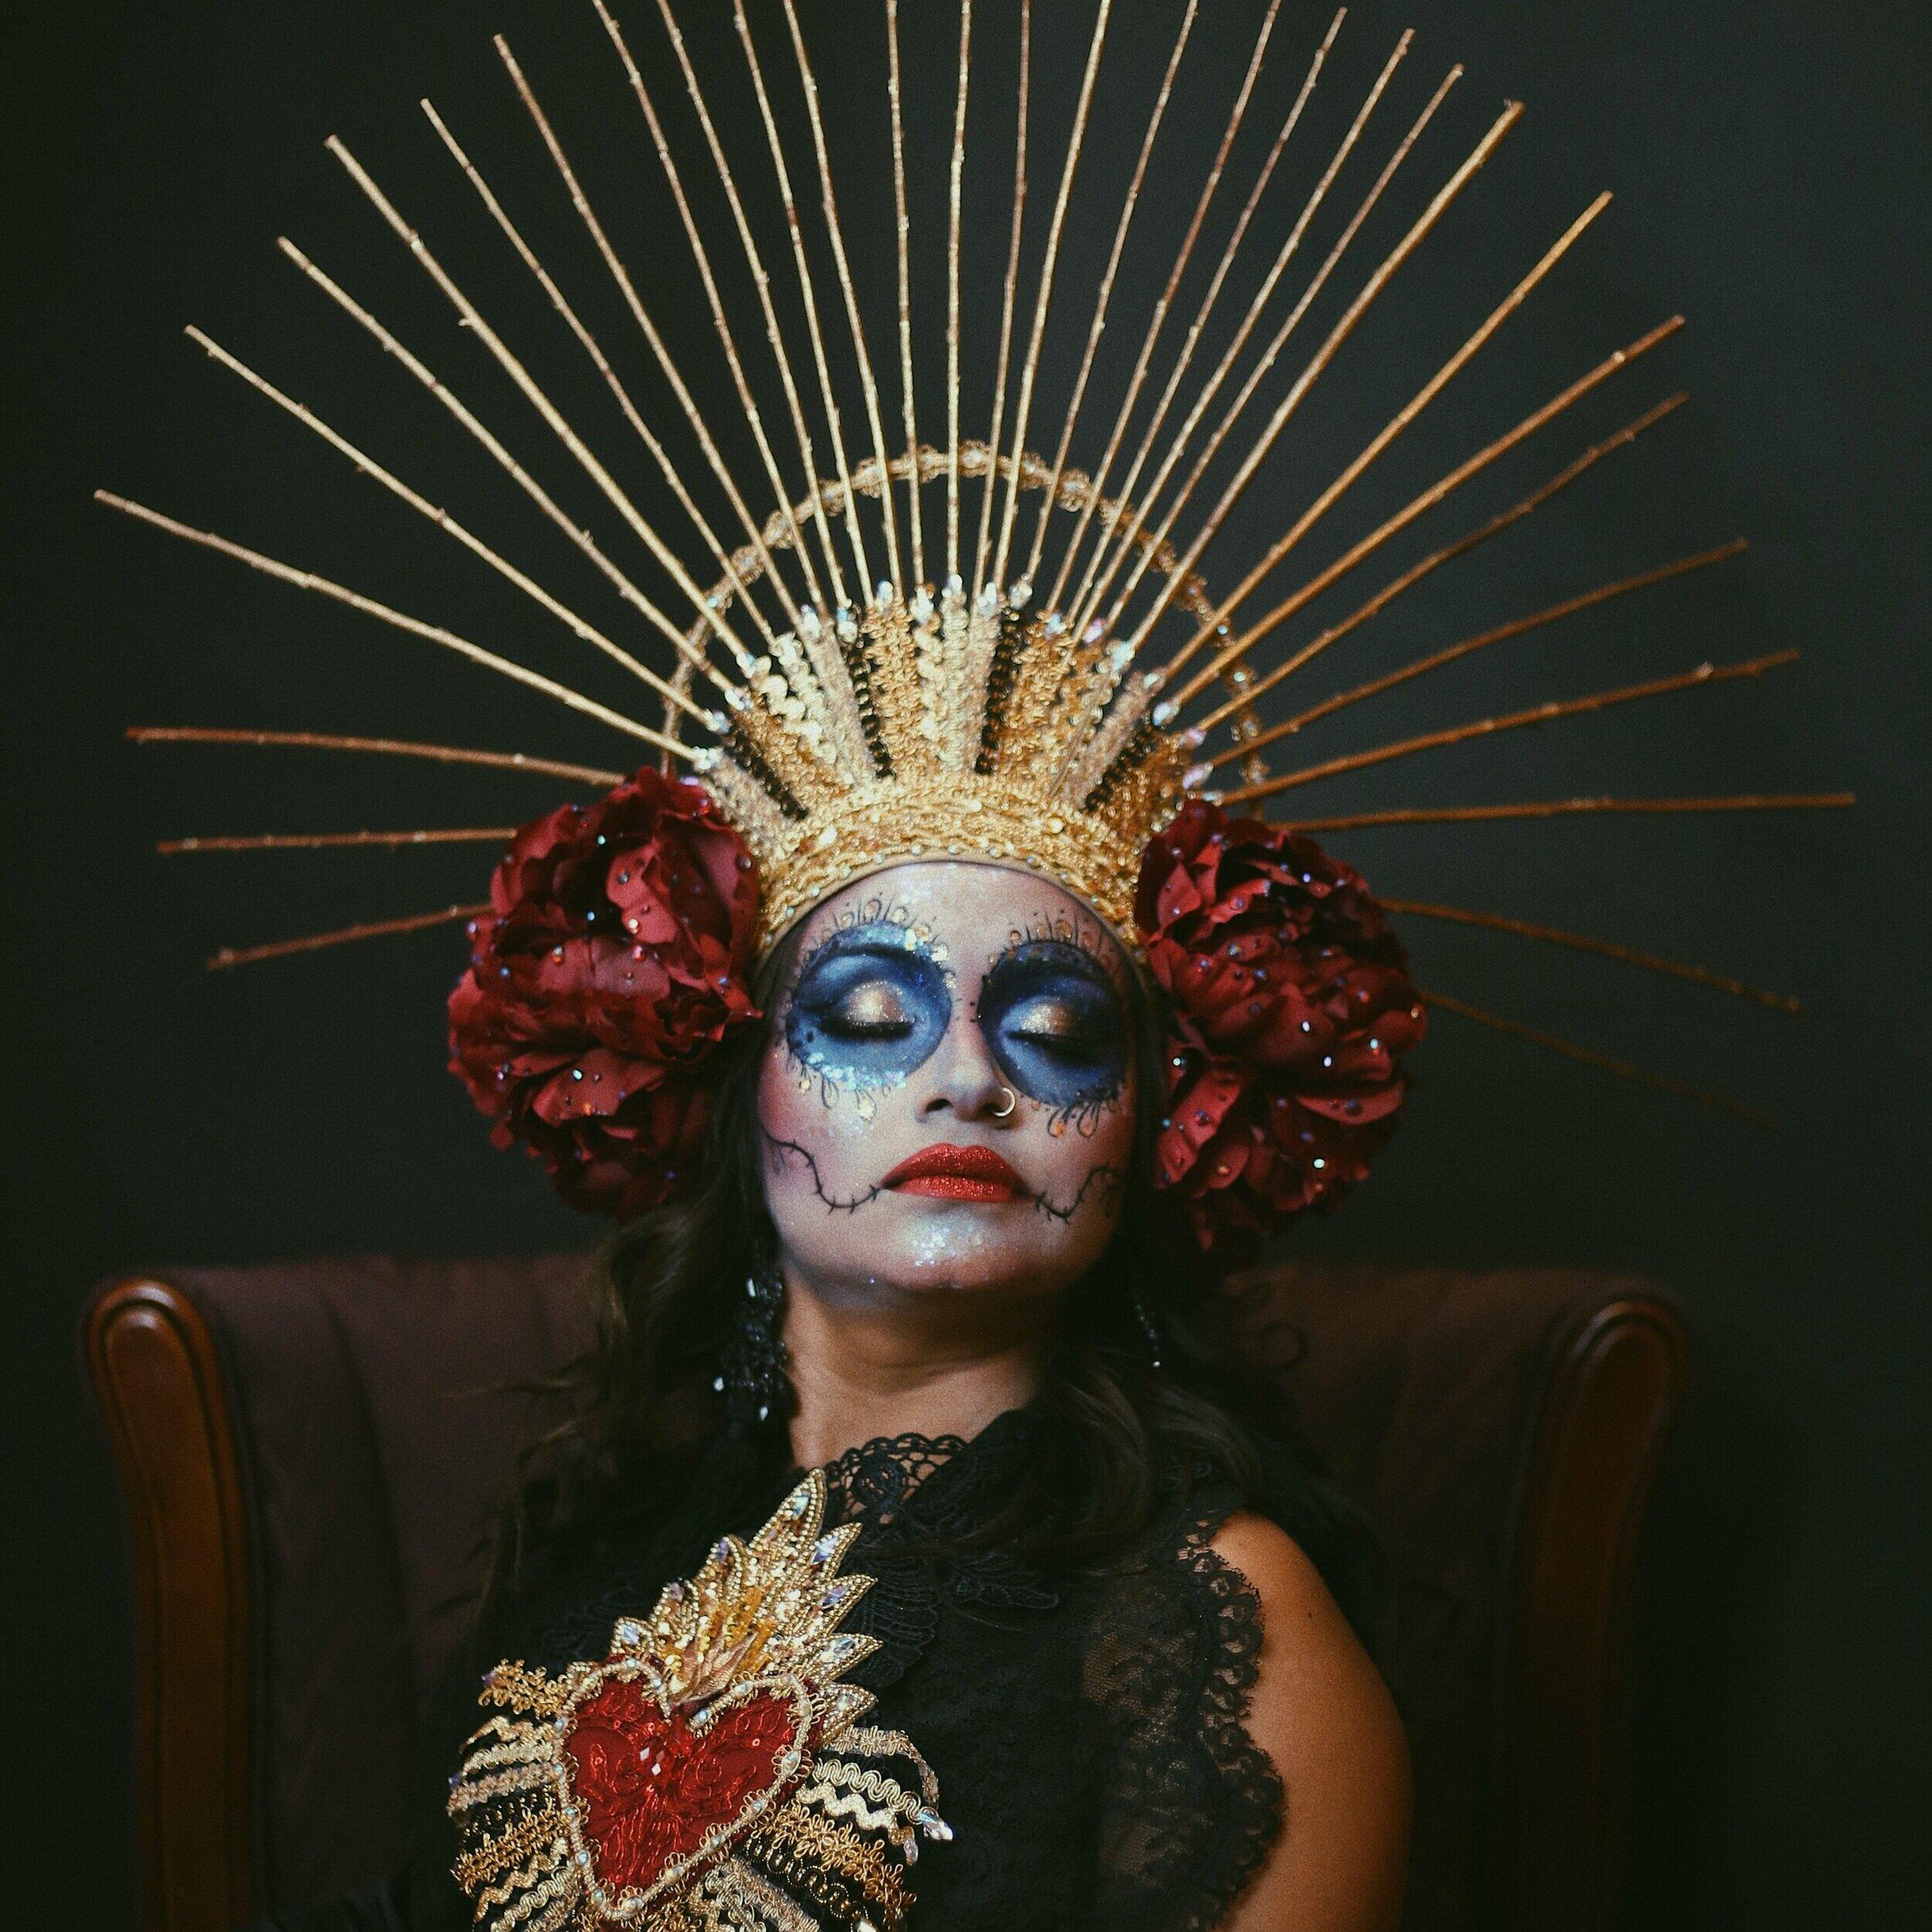 TAROT/SPIRITUAL GUIDANCE: VALERIA RUELAS